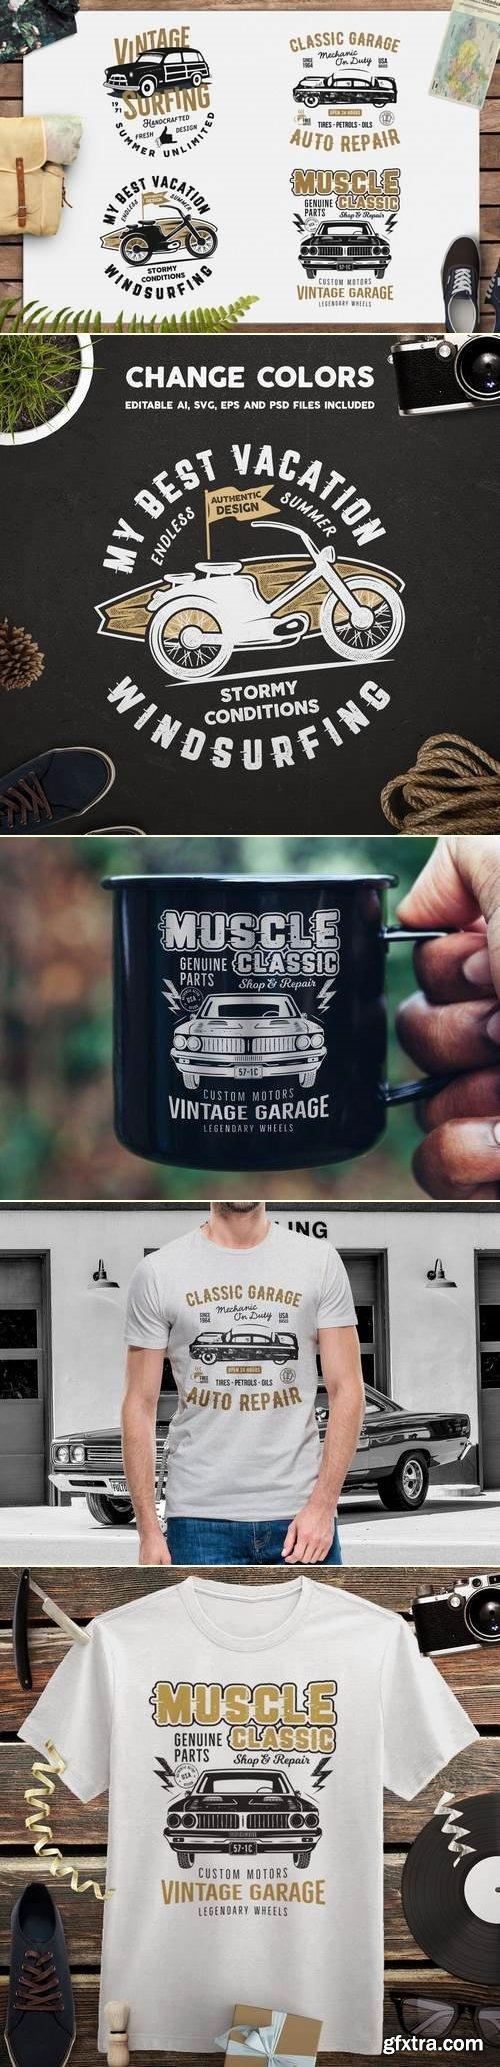 Summer Surf T-Shirt and Classic Garage Emblems